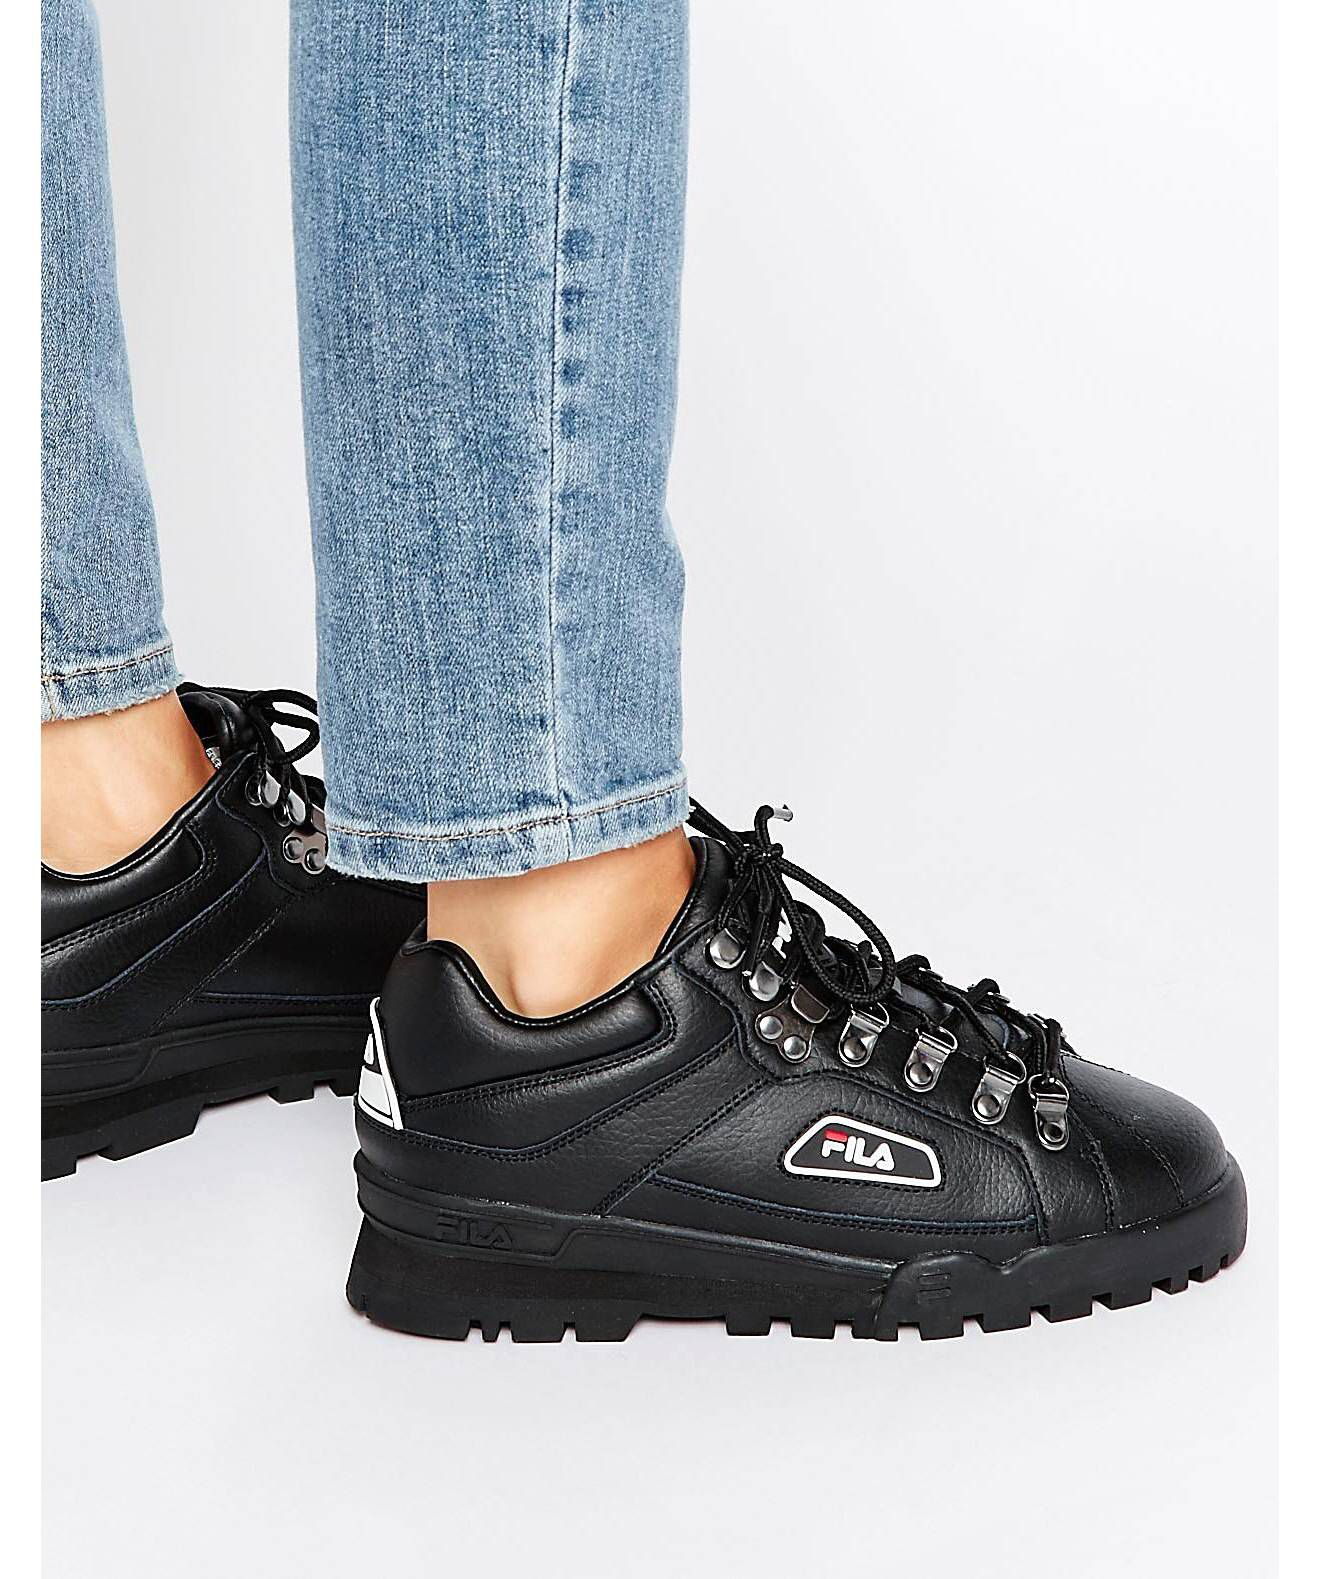 Fila Trailblazer | Sneakers, Vintage sneakers, Vintage boots